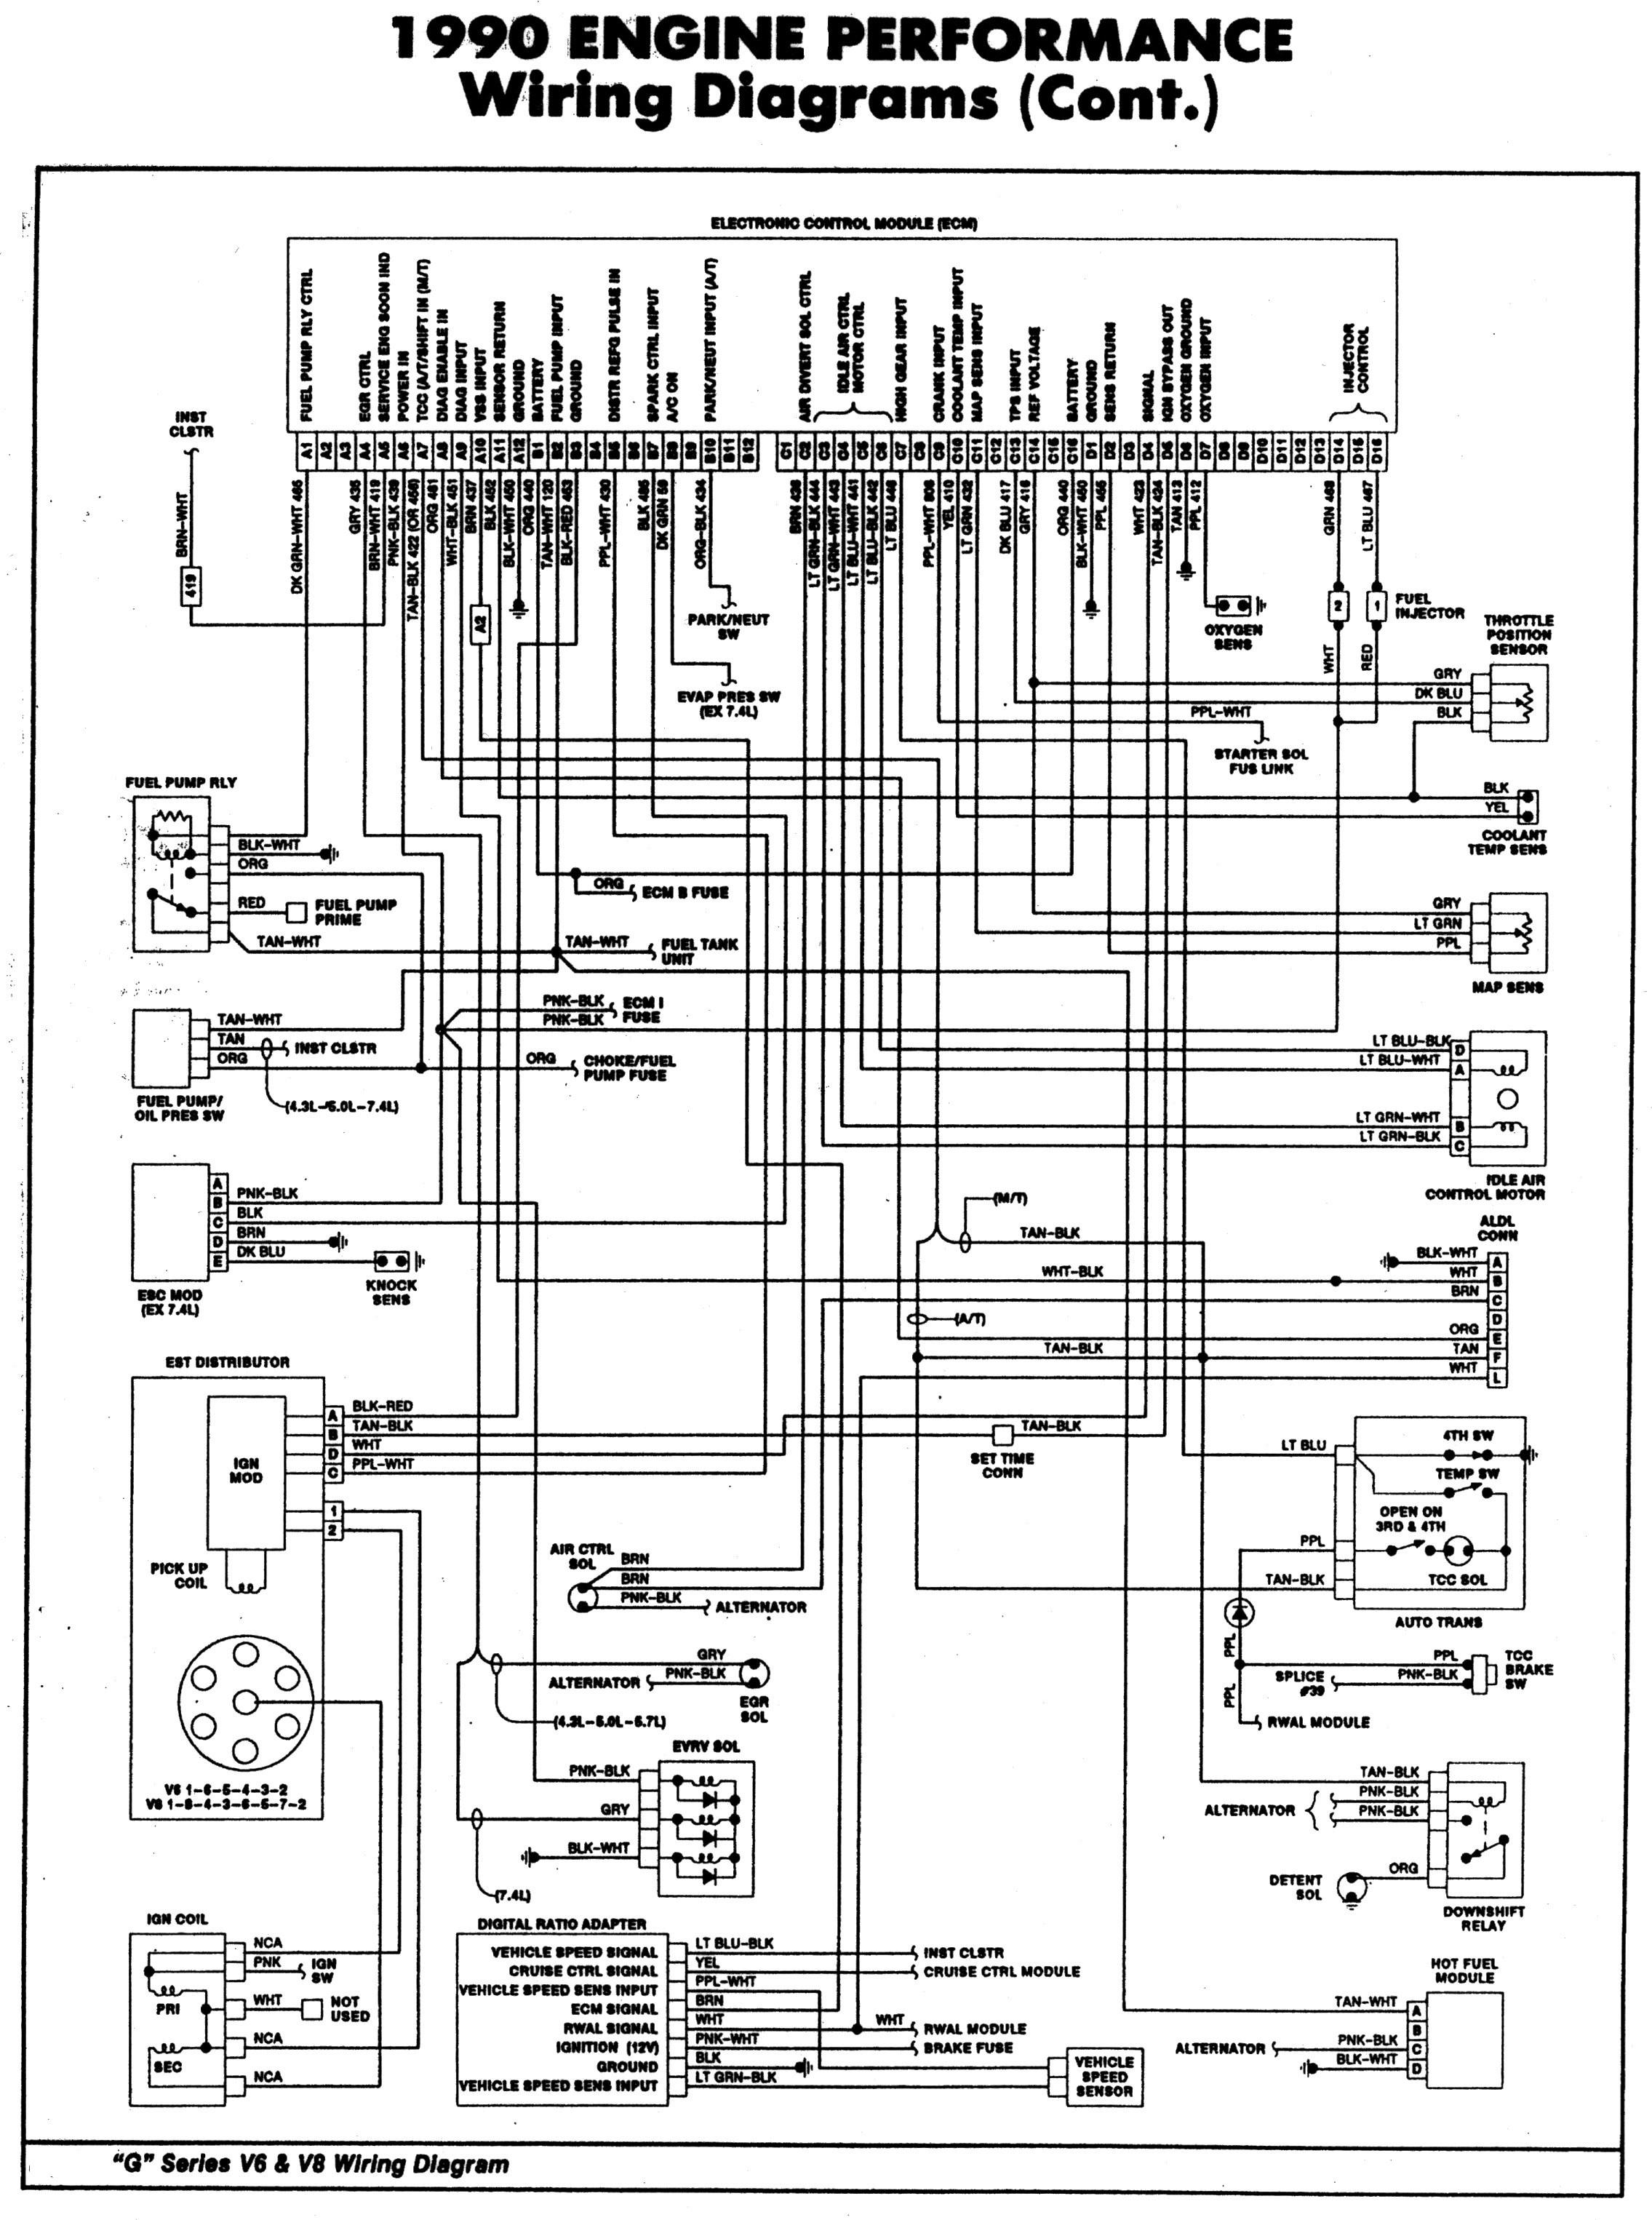 2008 Dodge Caravan Engine Diagram 2008 Dodge Grand Caravan Wiring Diagram Worksheet and Wiring Diagram • Of 2008 Dodge Caravan Engine Diagram